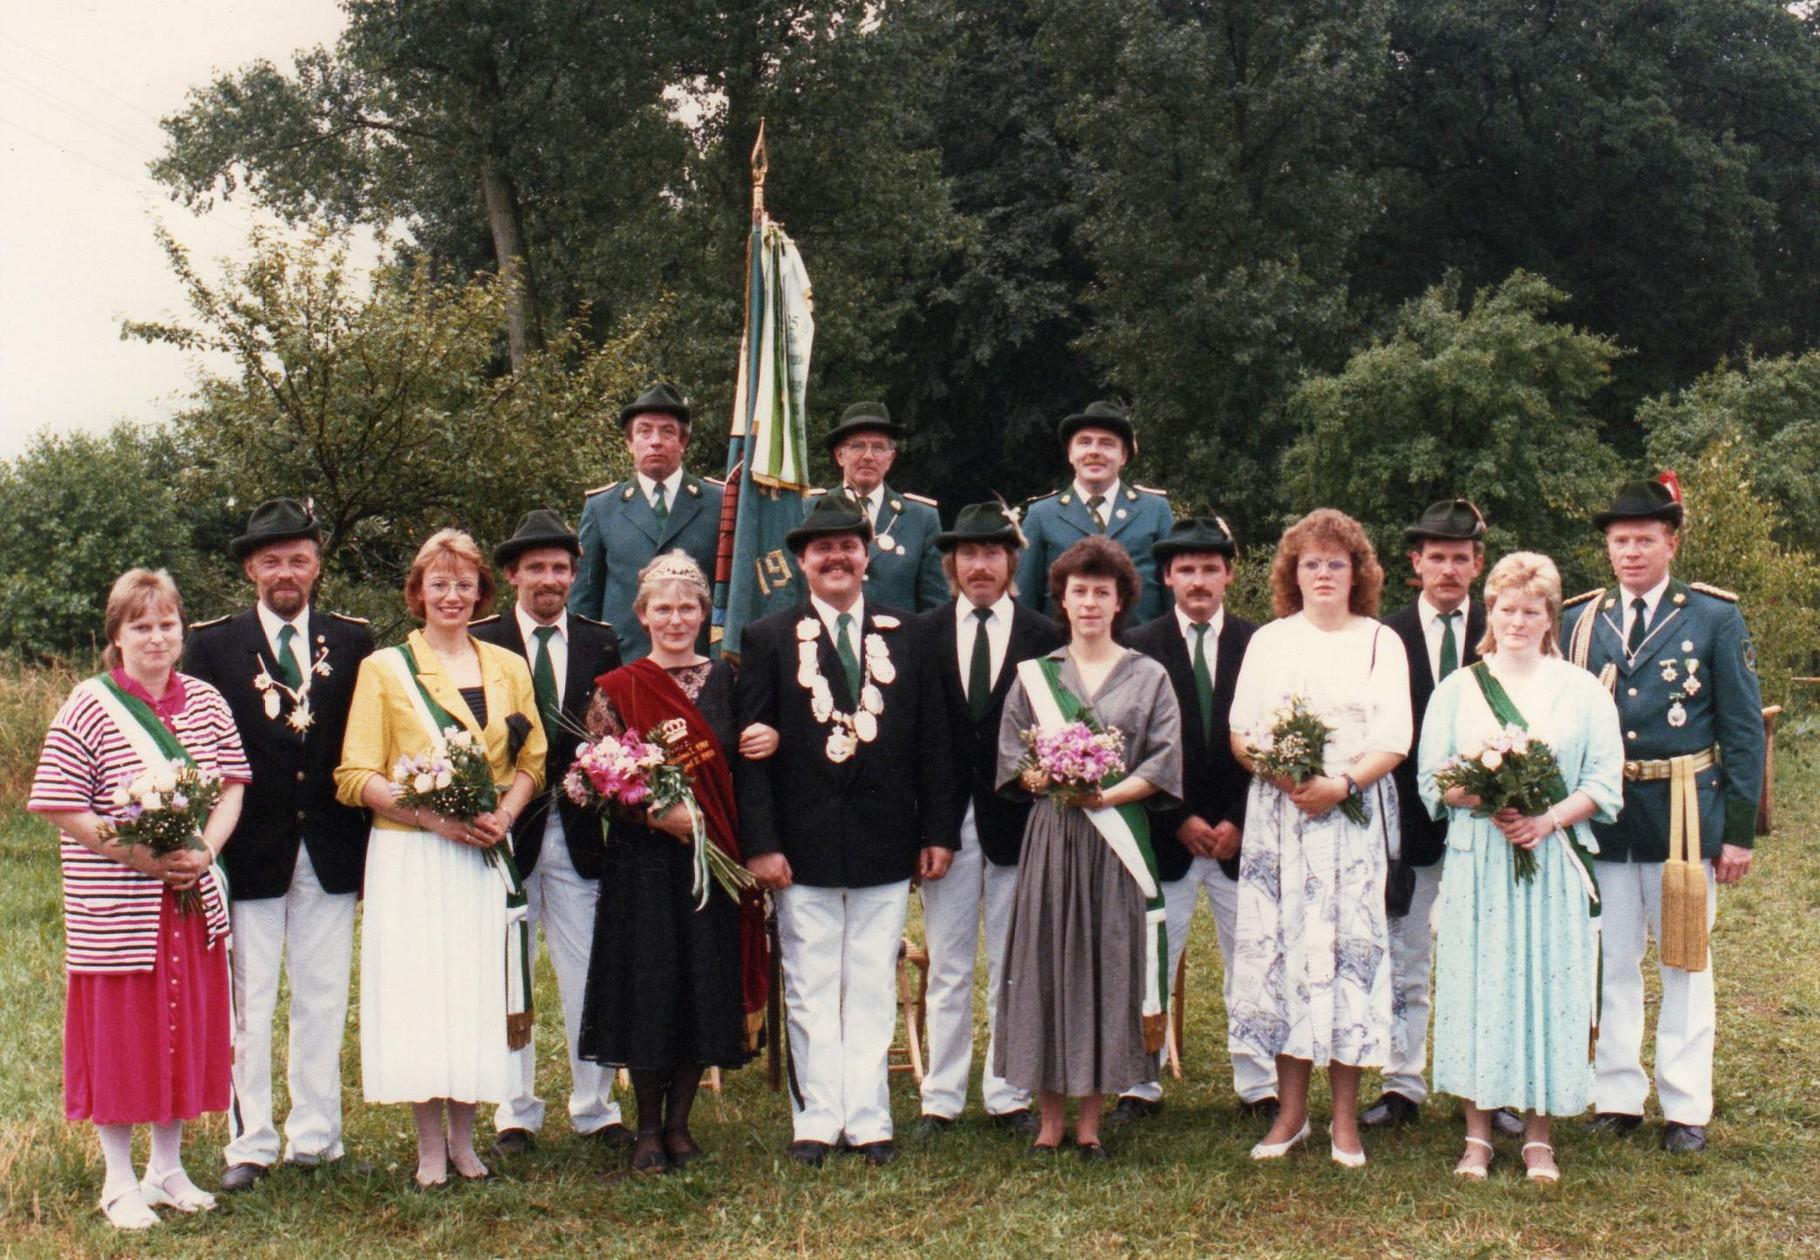 1989: König Karl-Heinz Pomberg und Königin Christel Pomberg